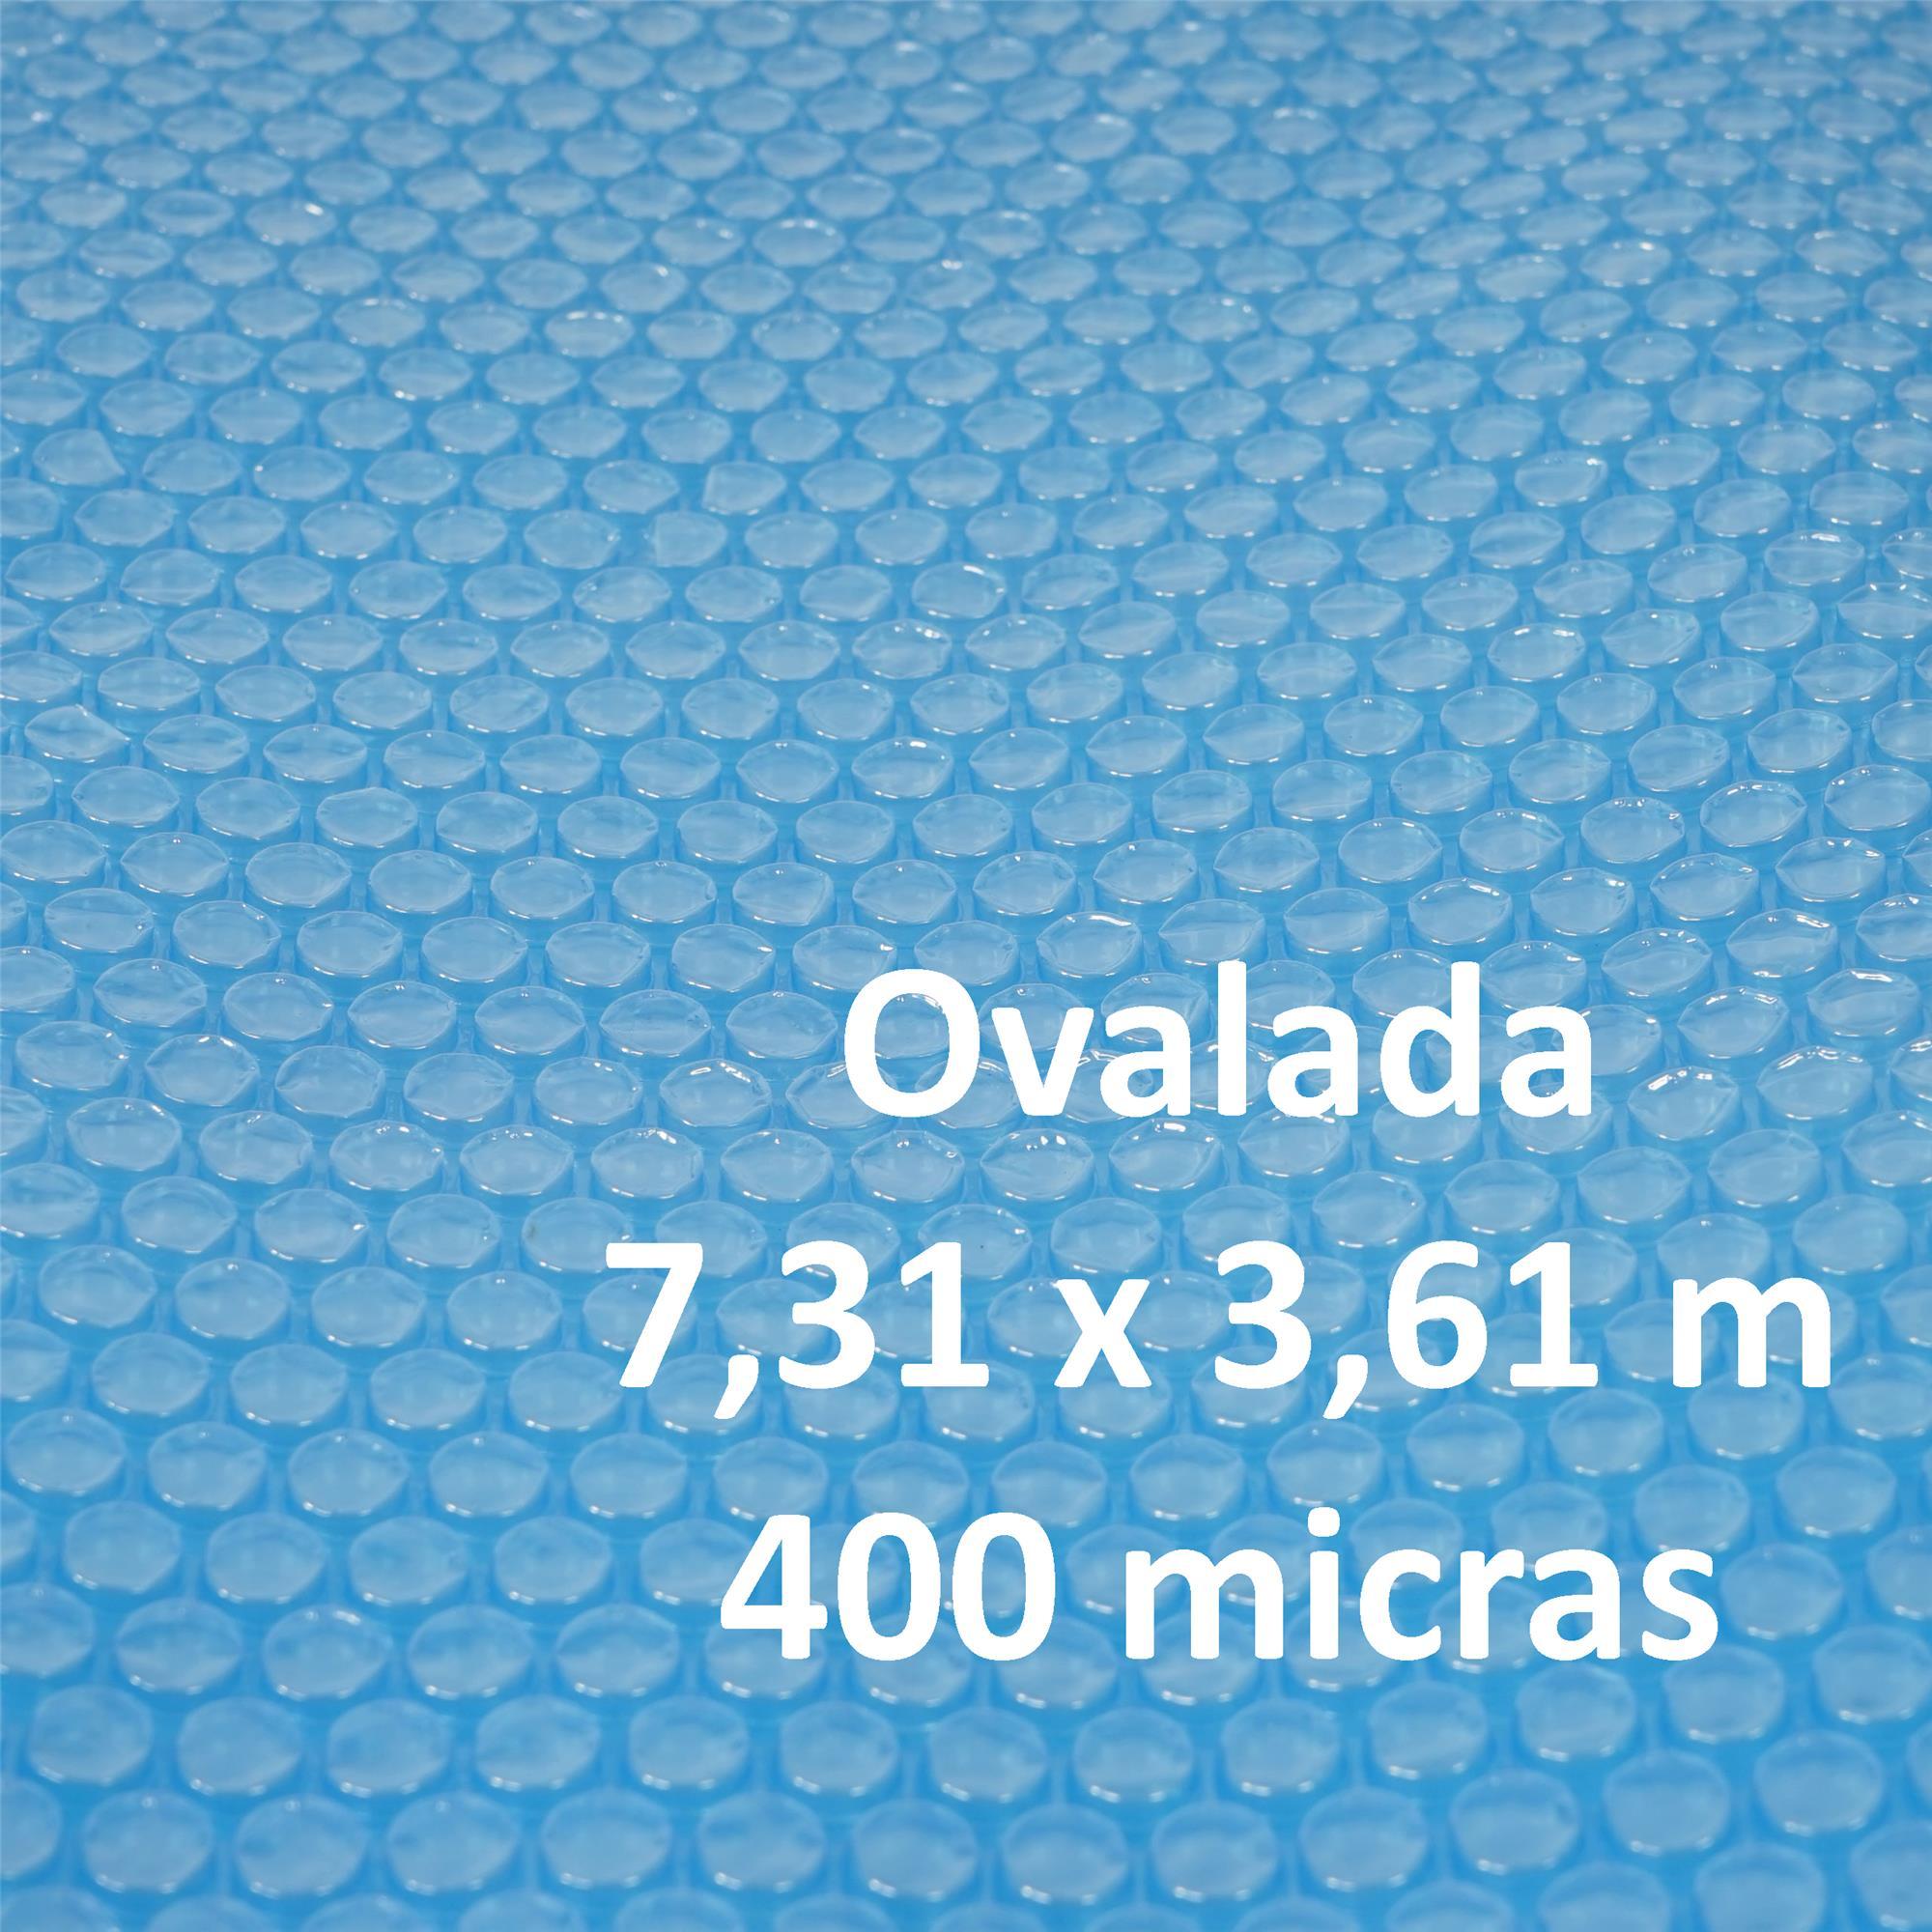 Cubierta lona t rmica piscina dimensiones 7 31x3 61 for Lona termica piscina